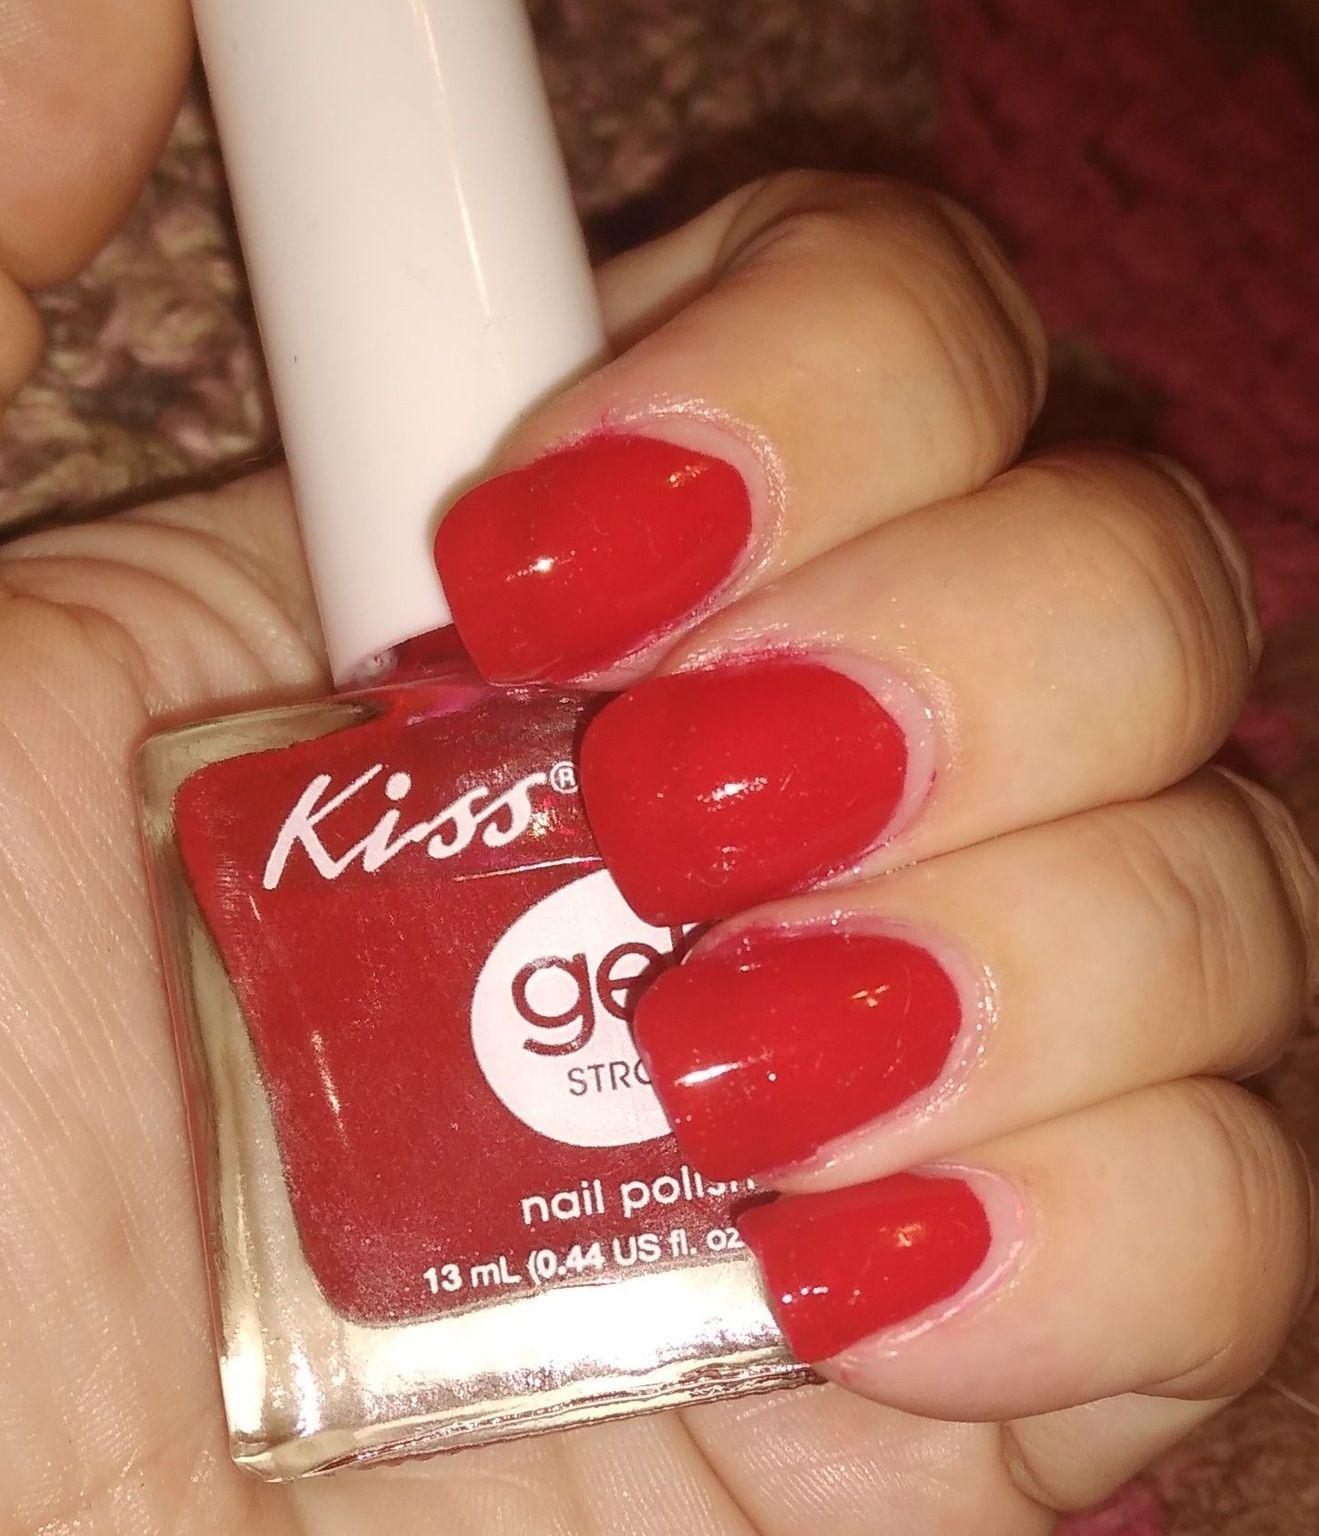 Kiss - Foliage (Uploaded by Kay12345678)